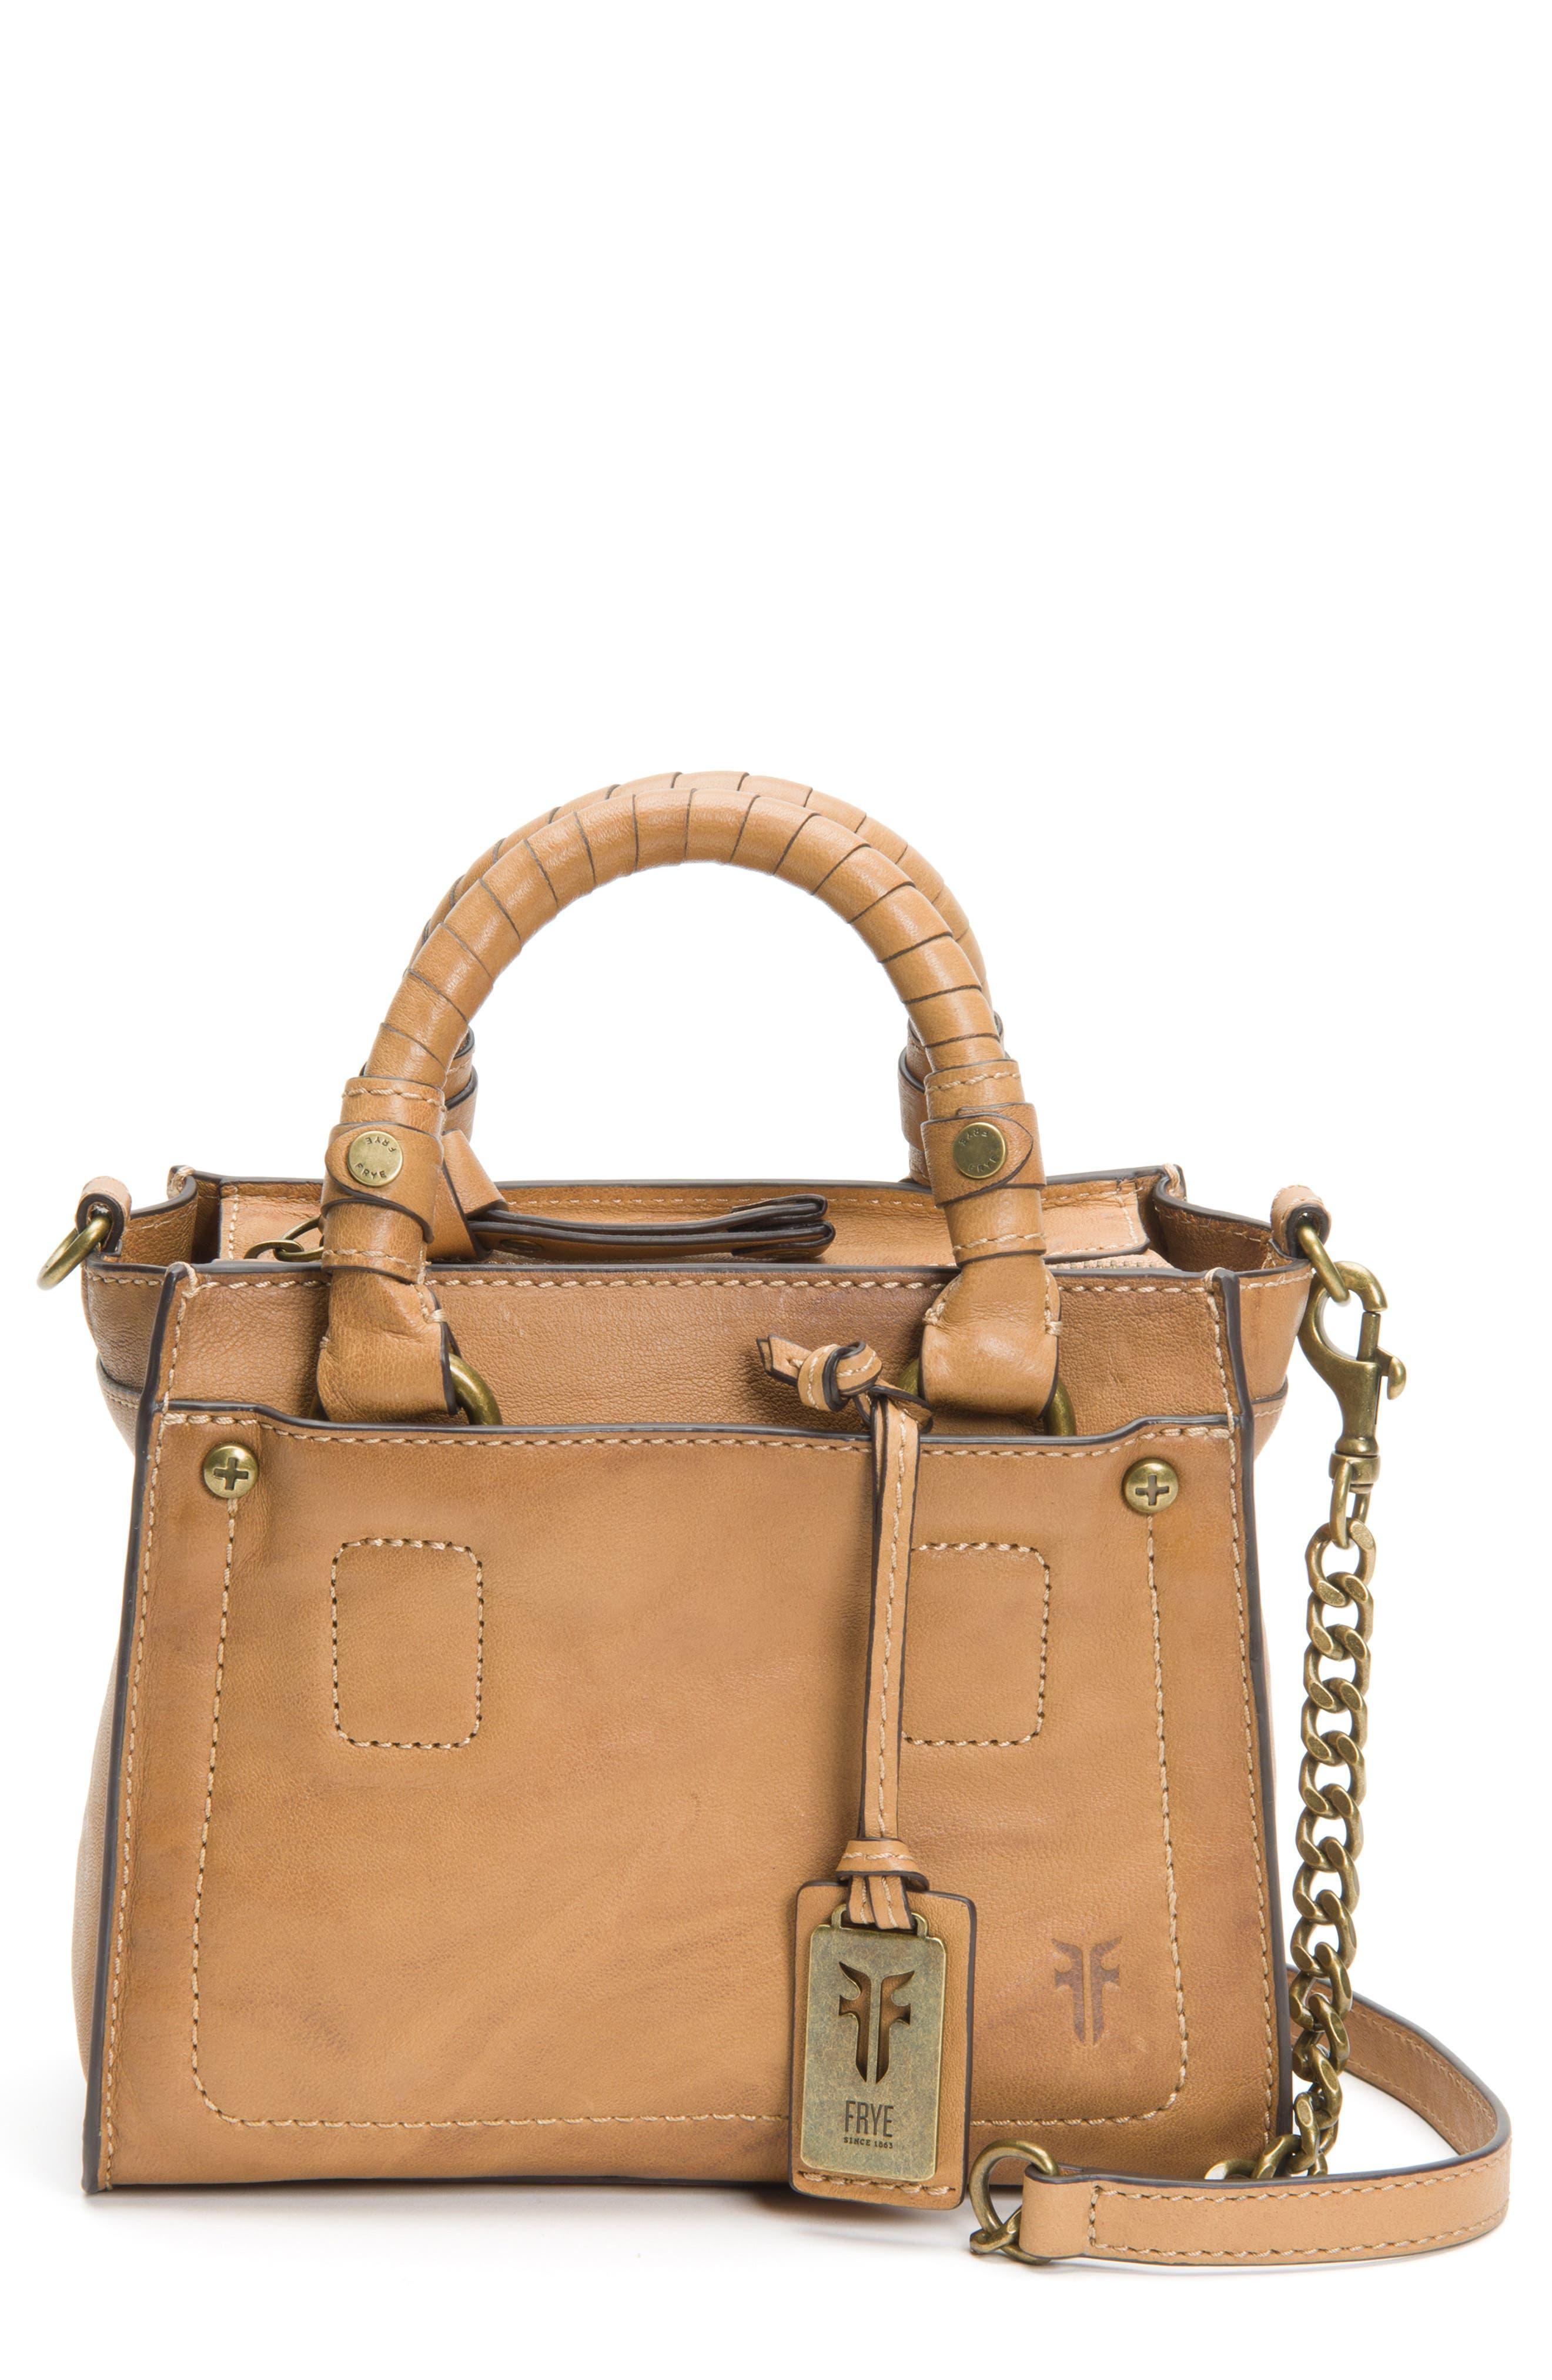 6c4fd9732c2e Women's Frye Handbags | Nordstrom